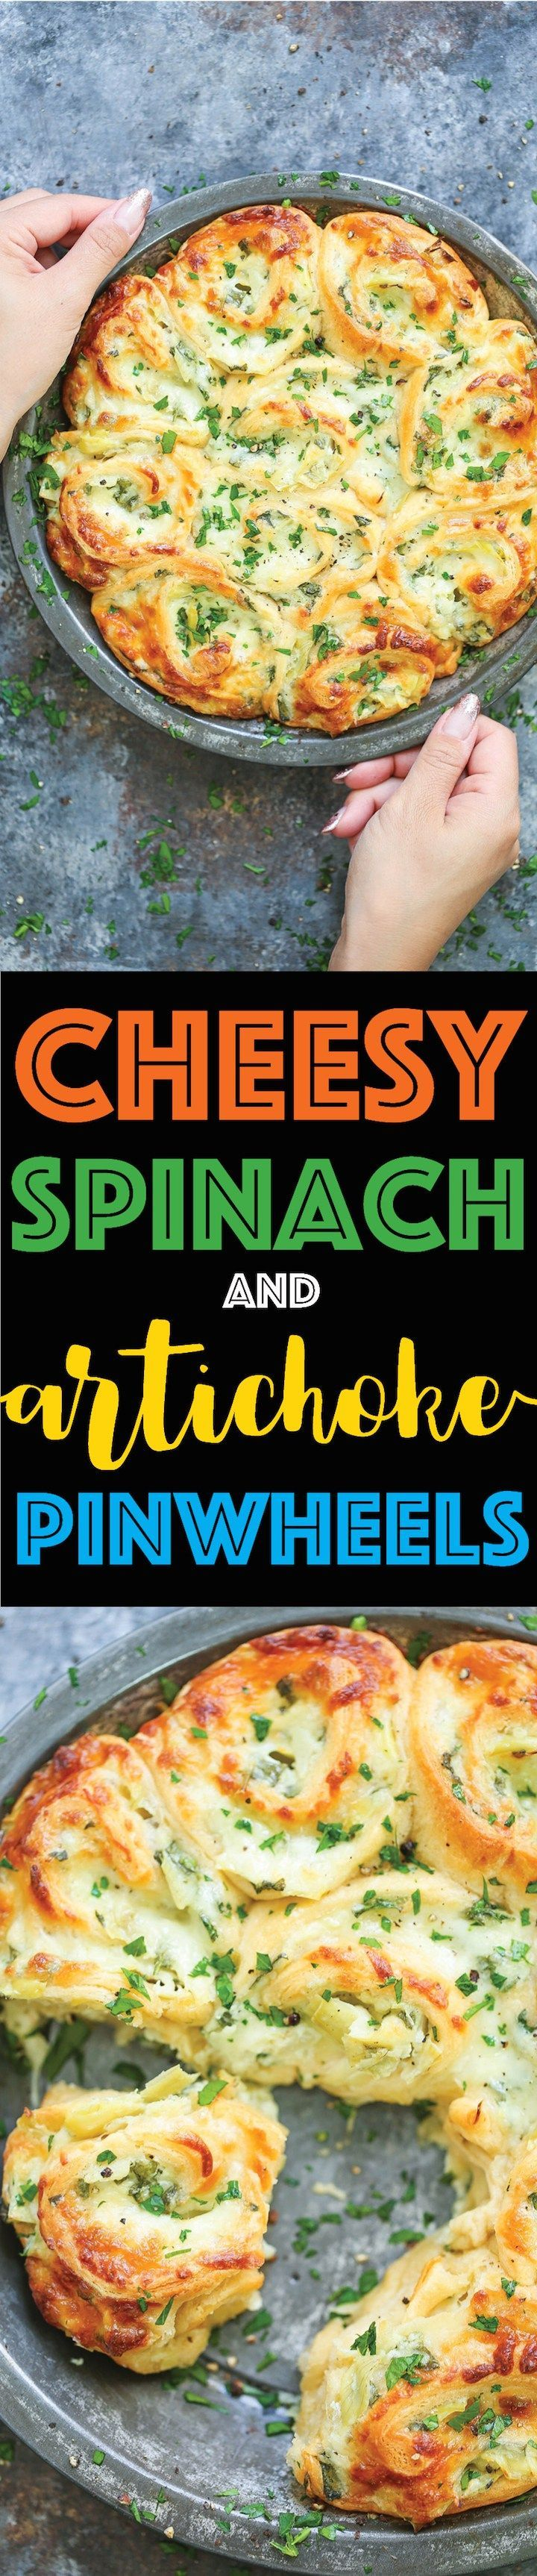 Cheesy Spinach and Artichoke Pinwheels